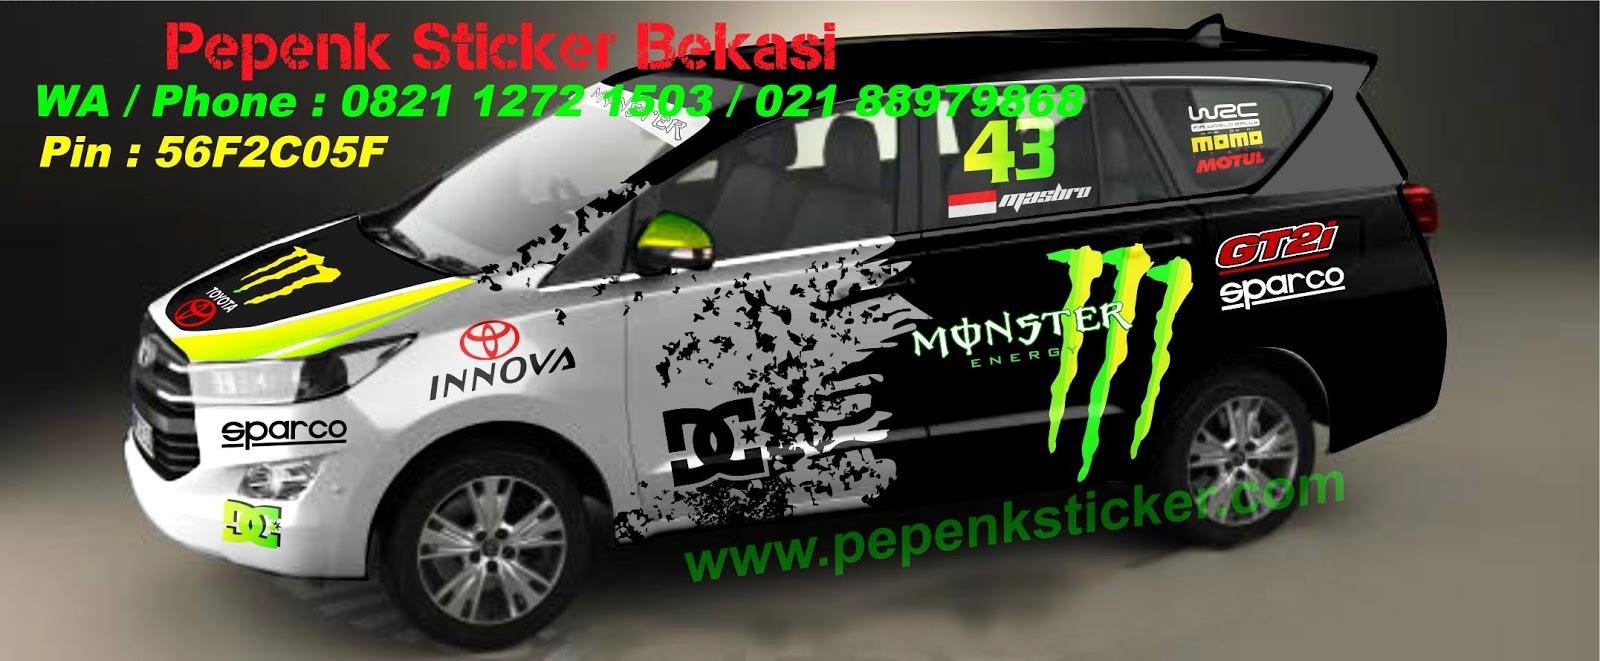 760 Gambar Cutting Sticker Mobil Kijang Terbaru